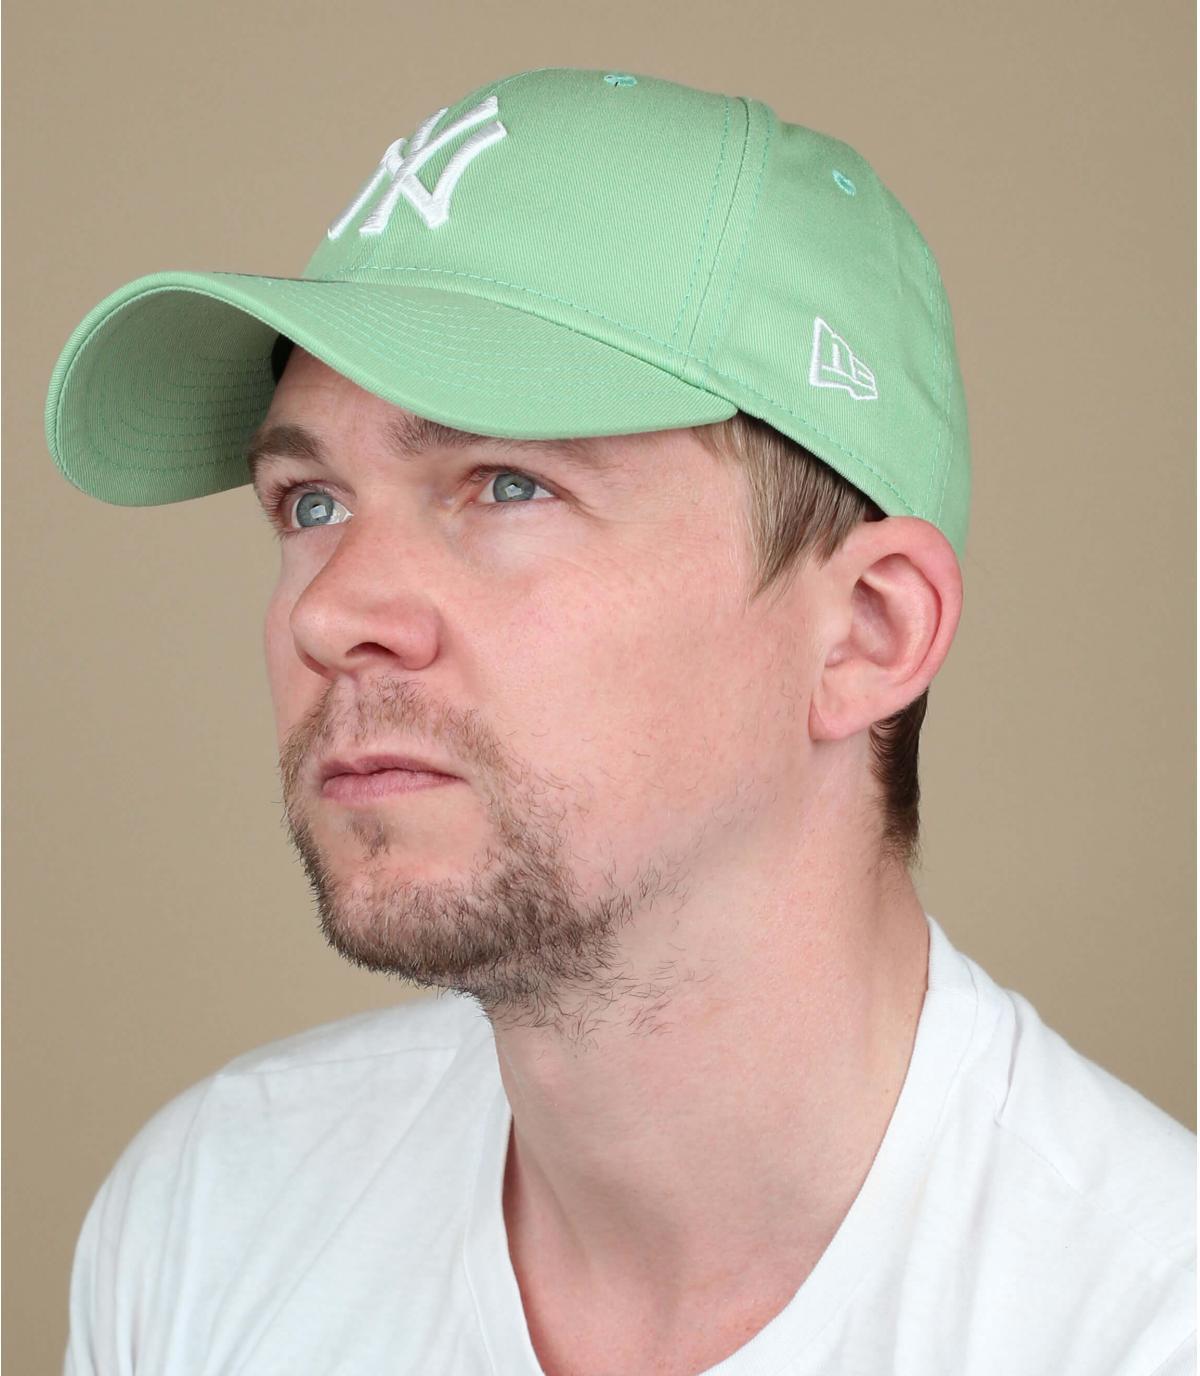 NY groen witte dop